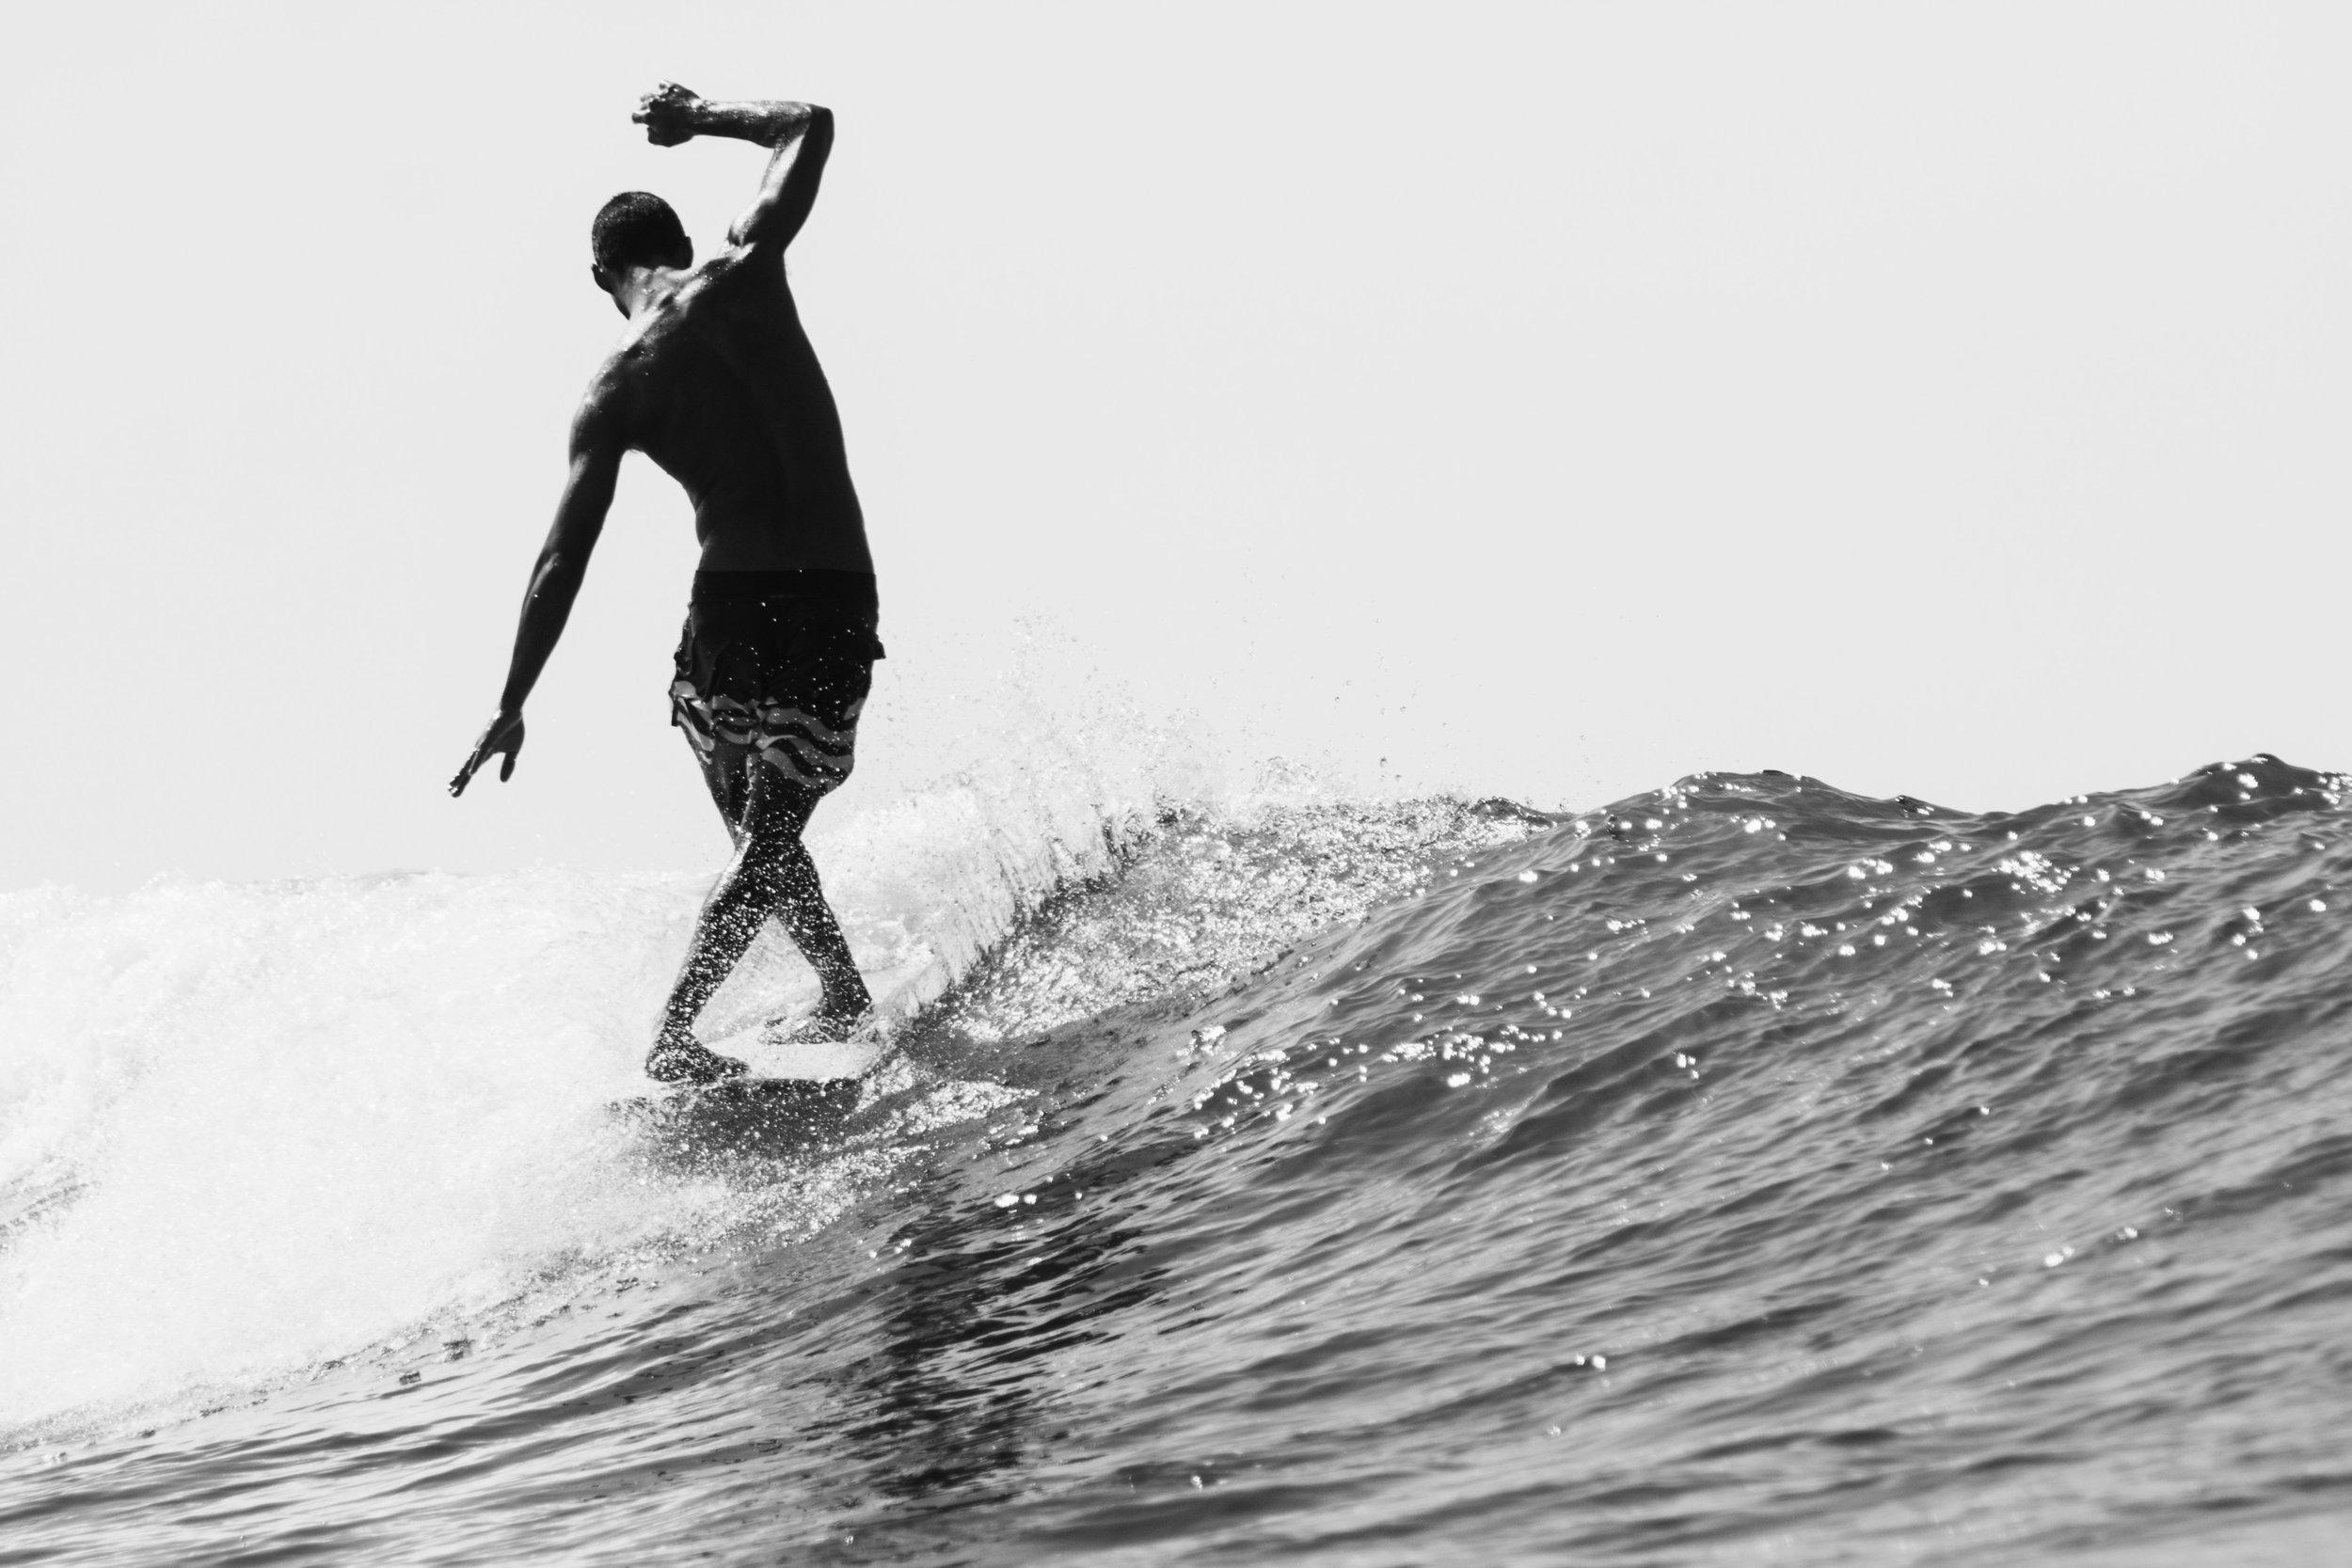 Surf-Mexico-Zihuatanejo-Sayulita-Ixtapa-Zihuatanejo-Diego-Cadena-Olas-Fotografia-Heiko-Bothe-29.jpg